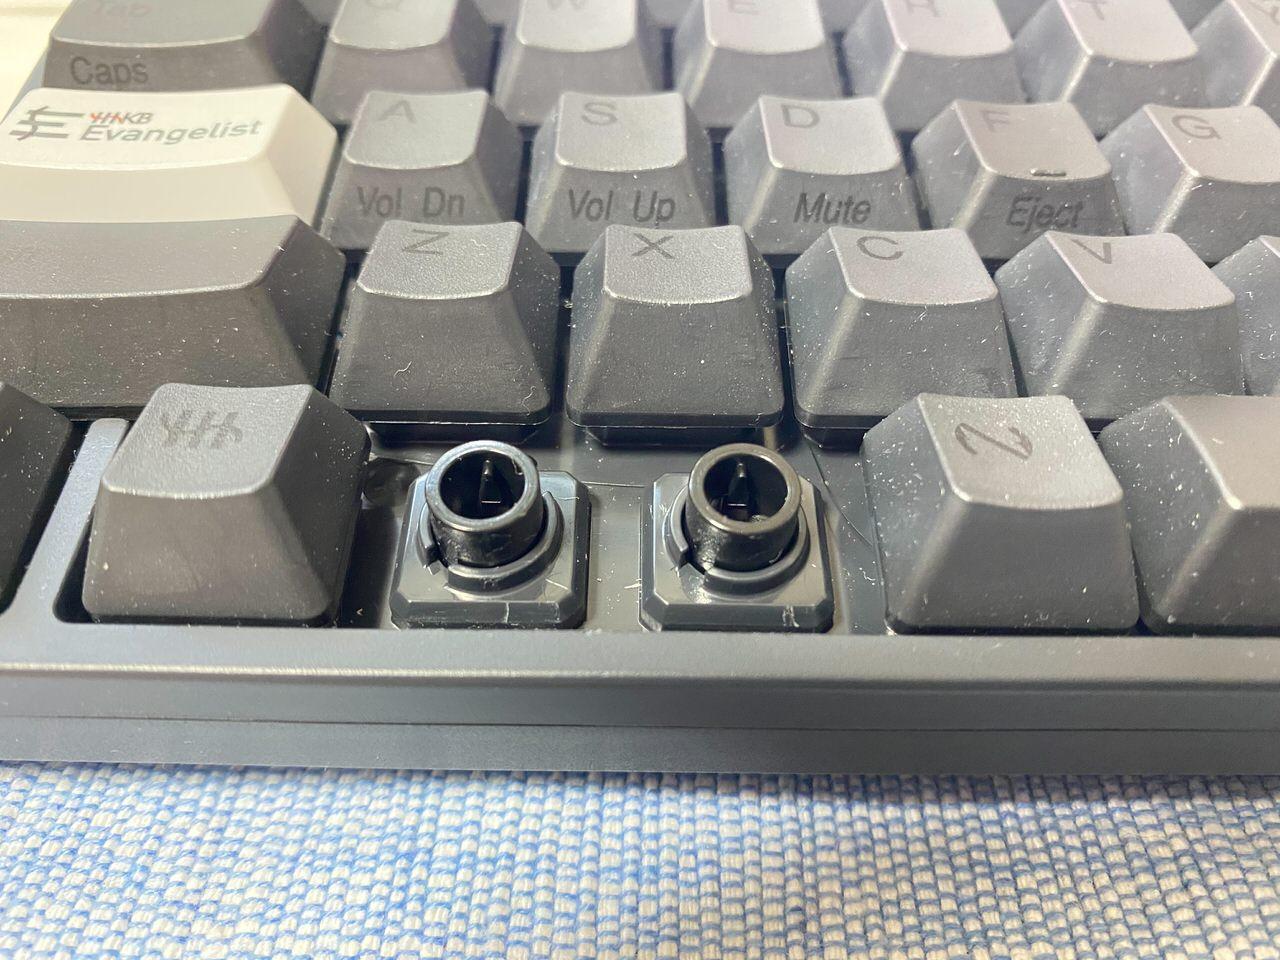 【HHKB】キートップを3Dプリンターで自作する 14